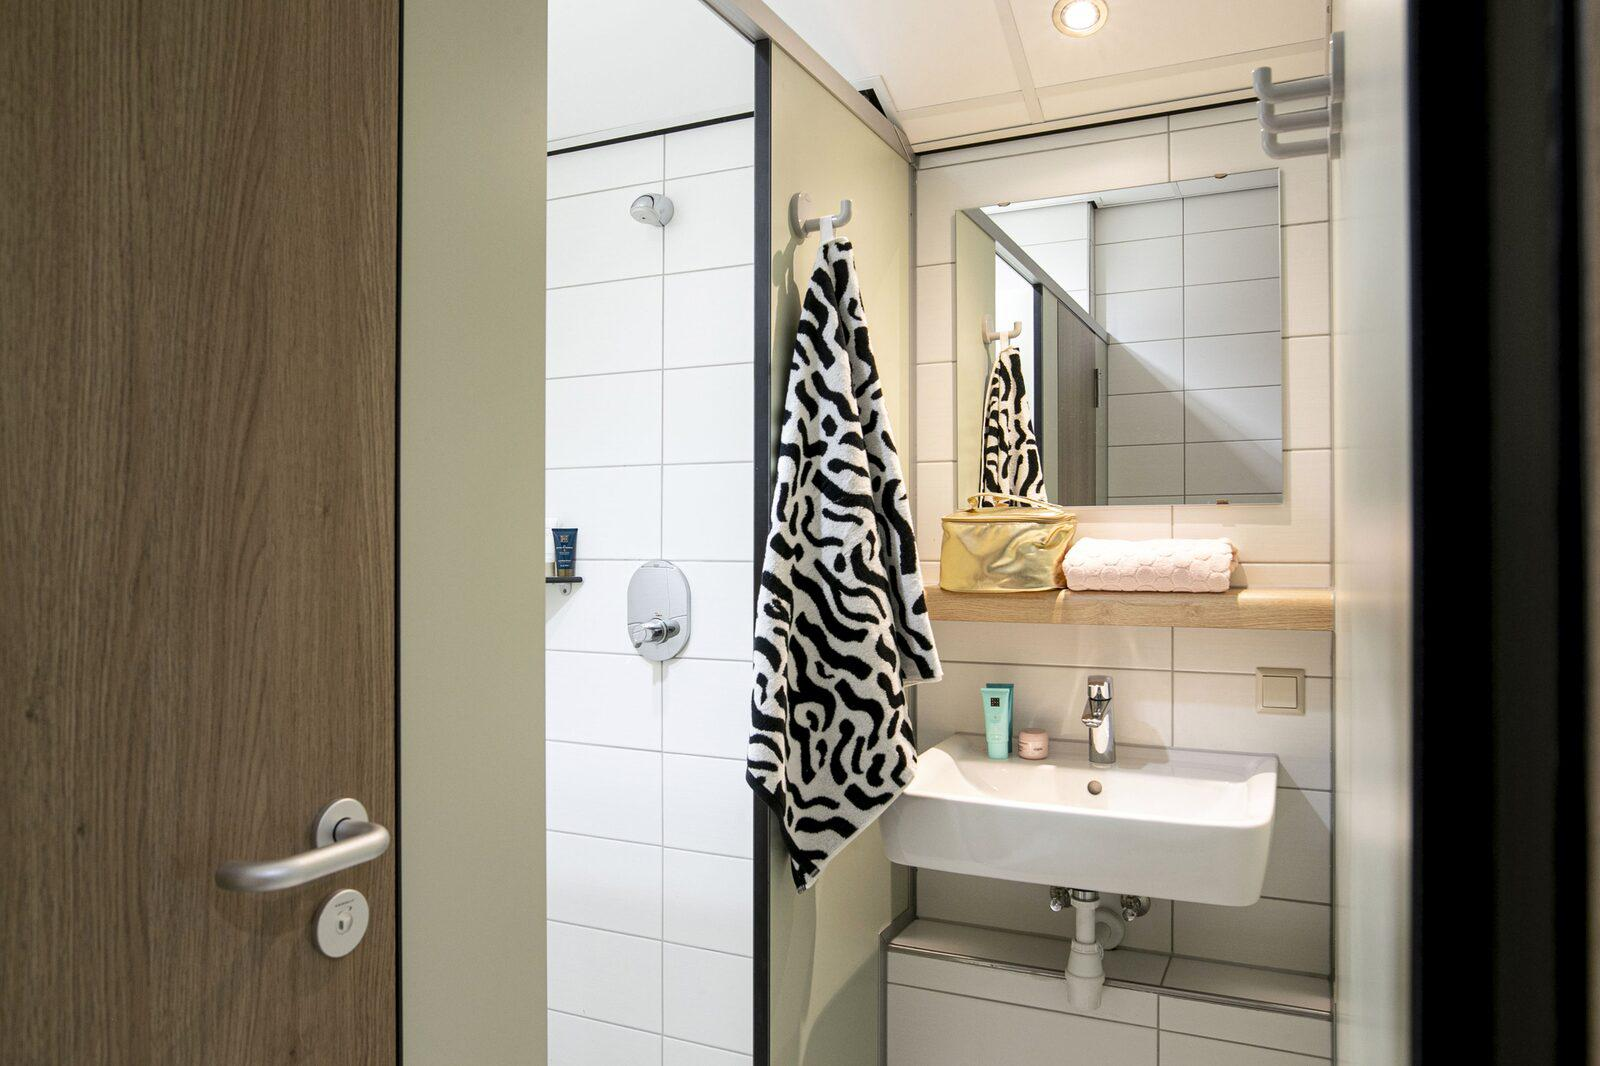 Witterzomer Kampeerplaats met privé badkamer Drenthe Assen